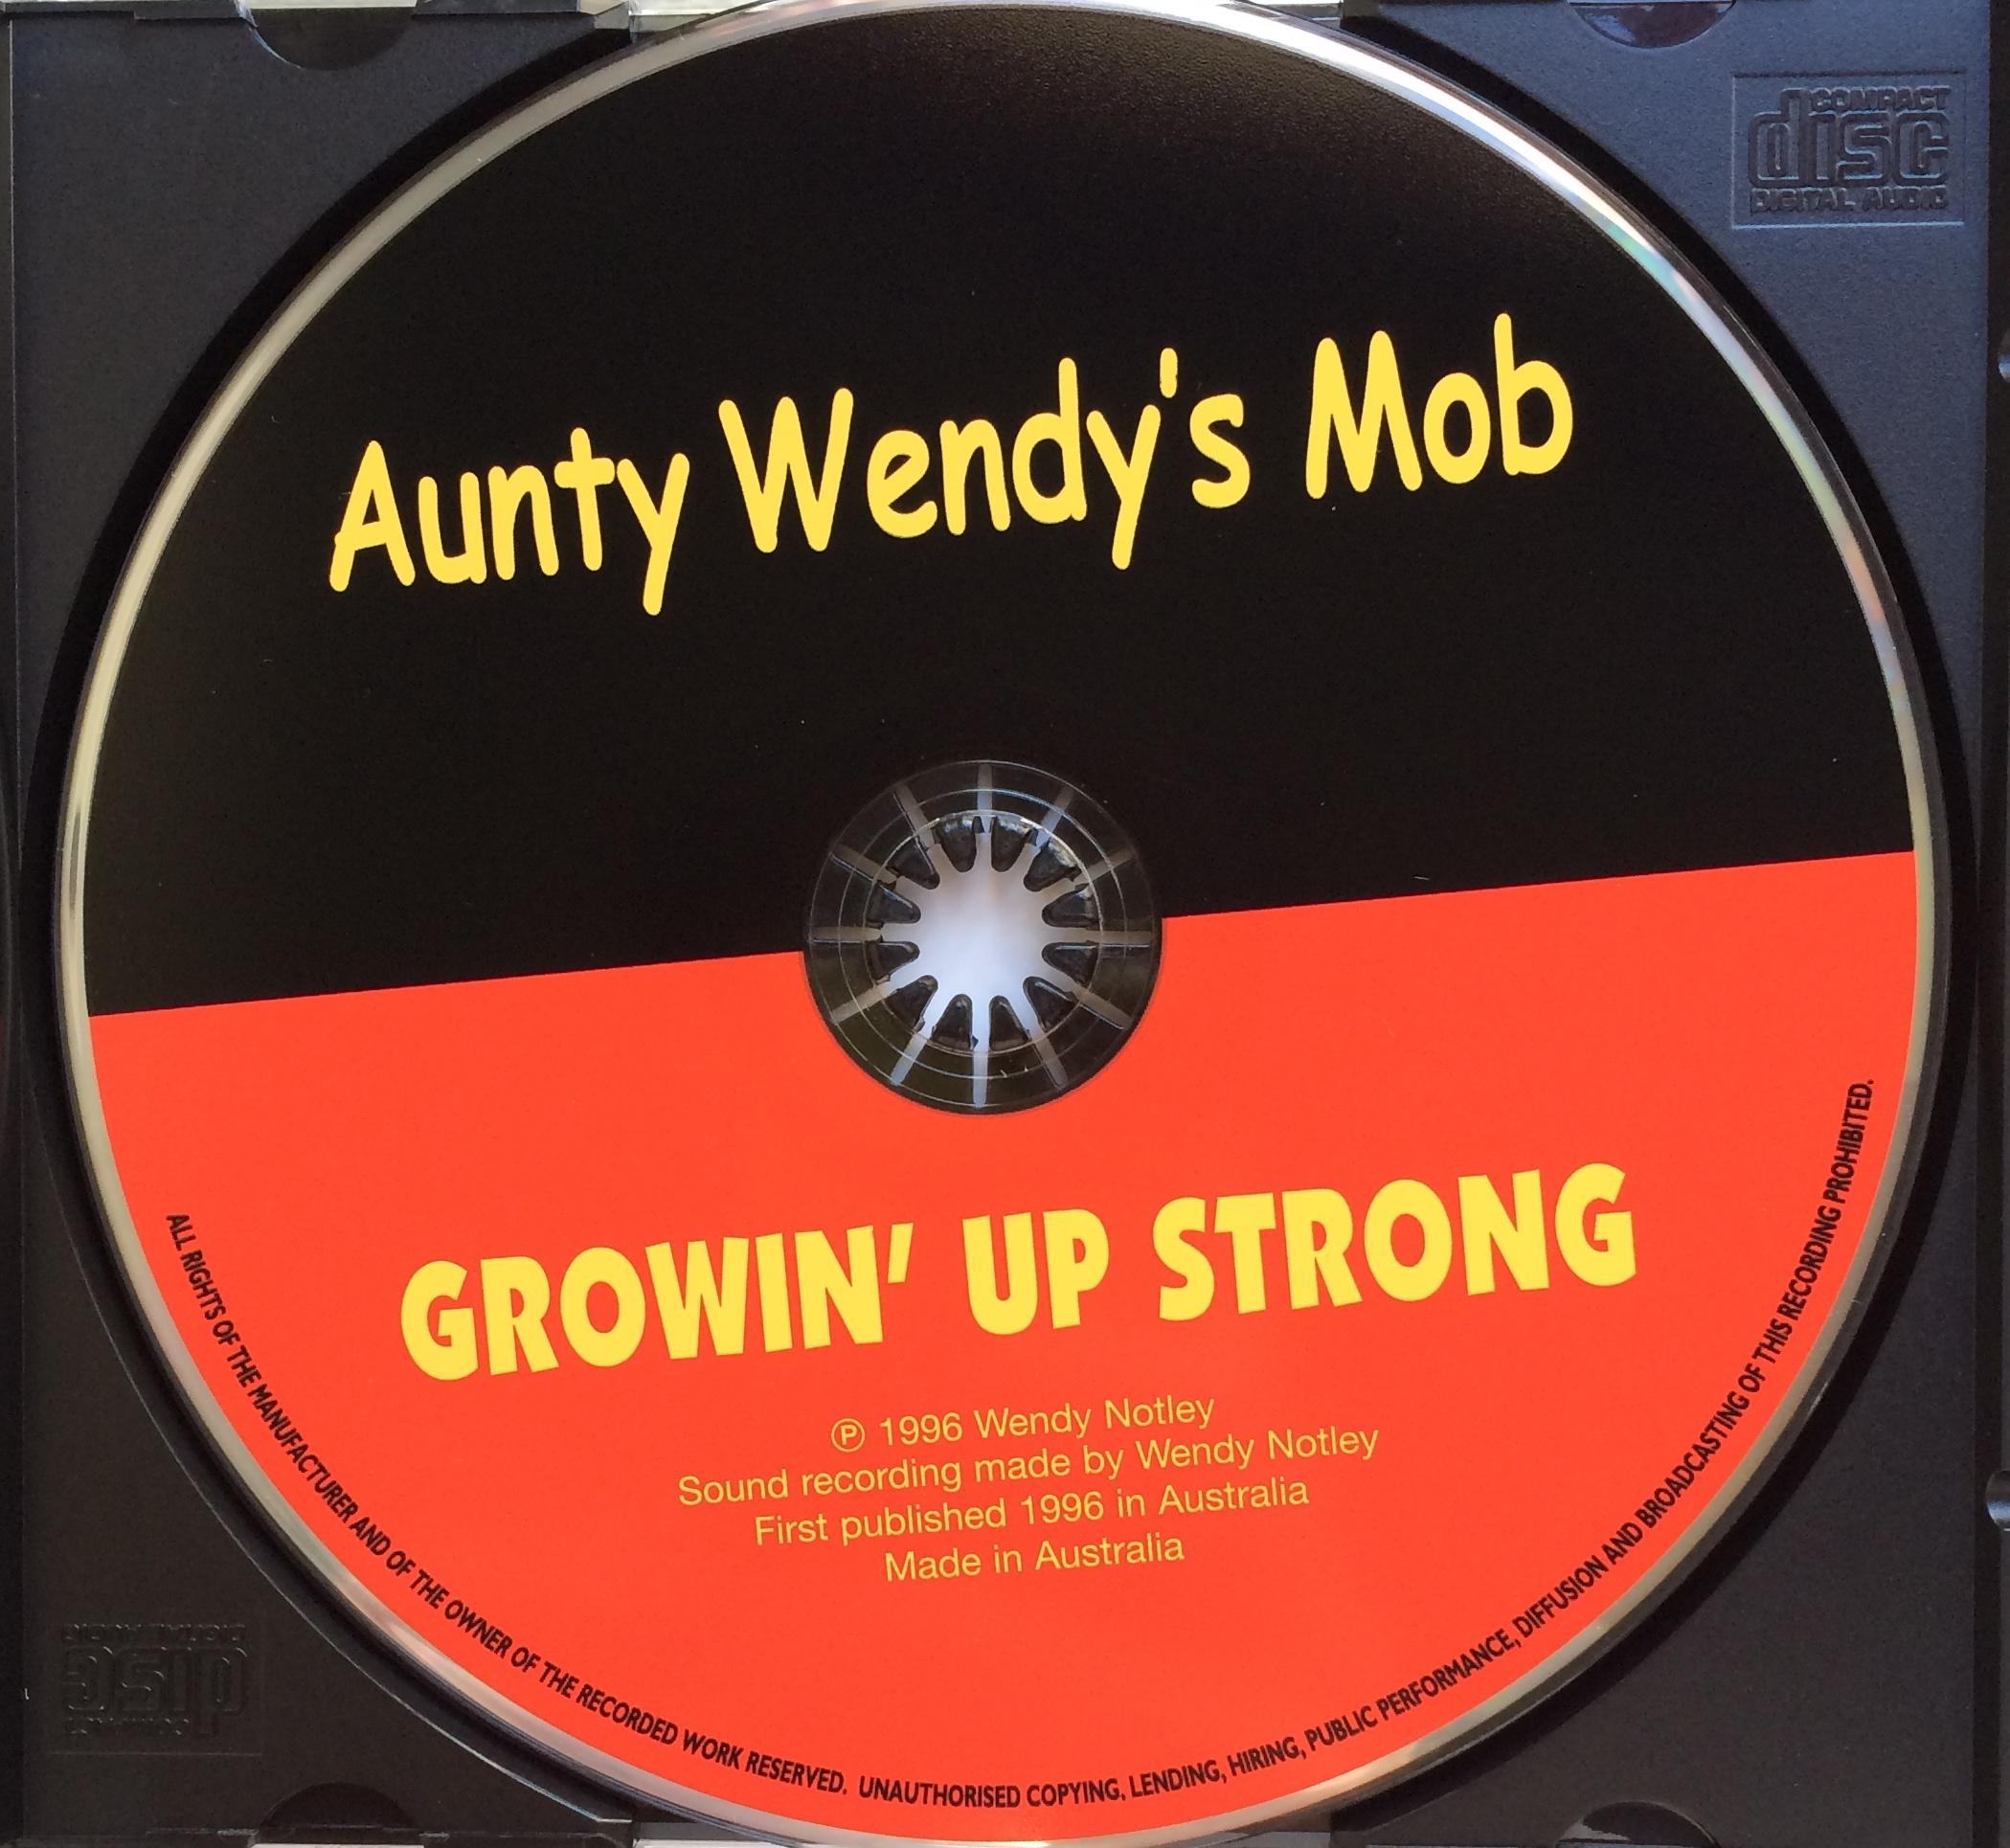 3.GROWIN' UP STRONG CD .jpg